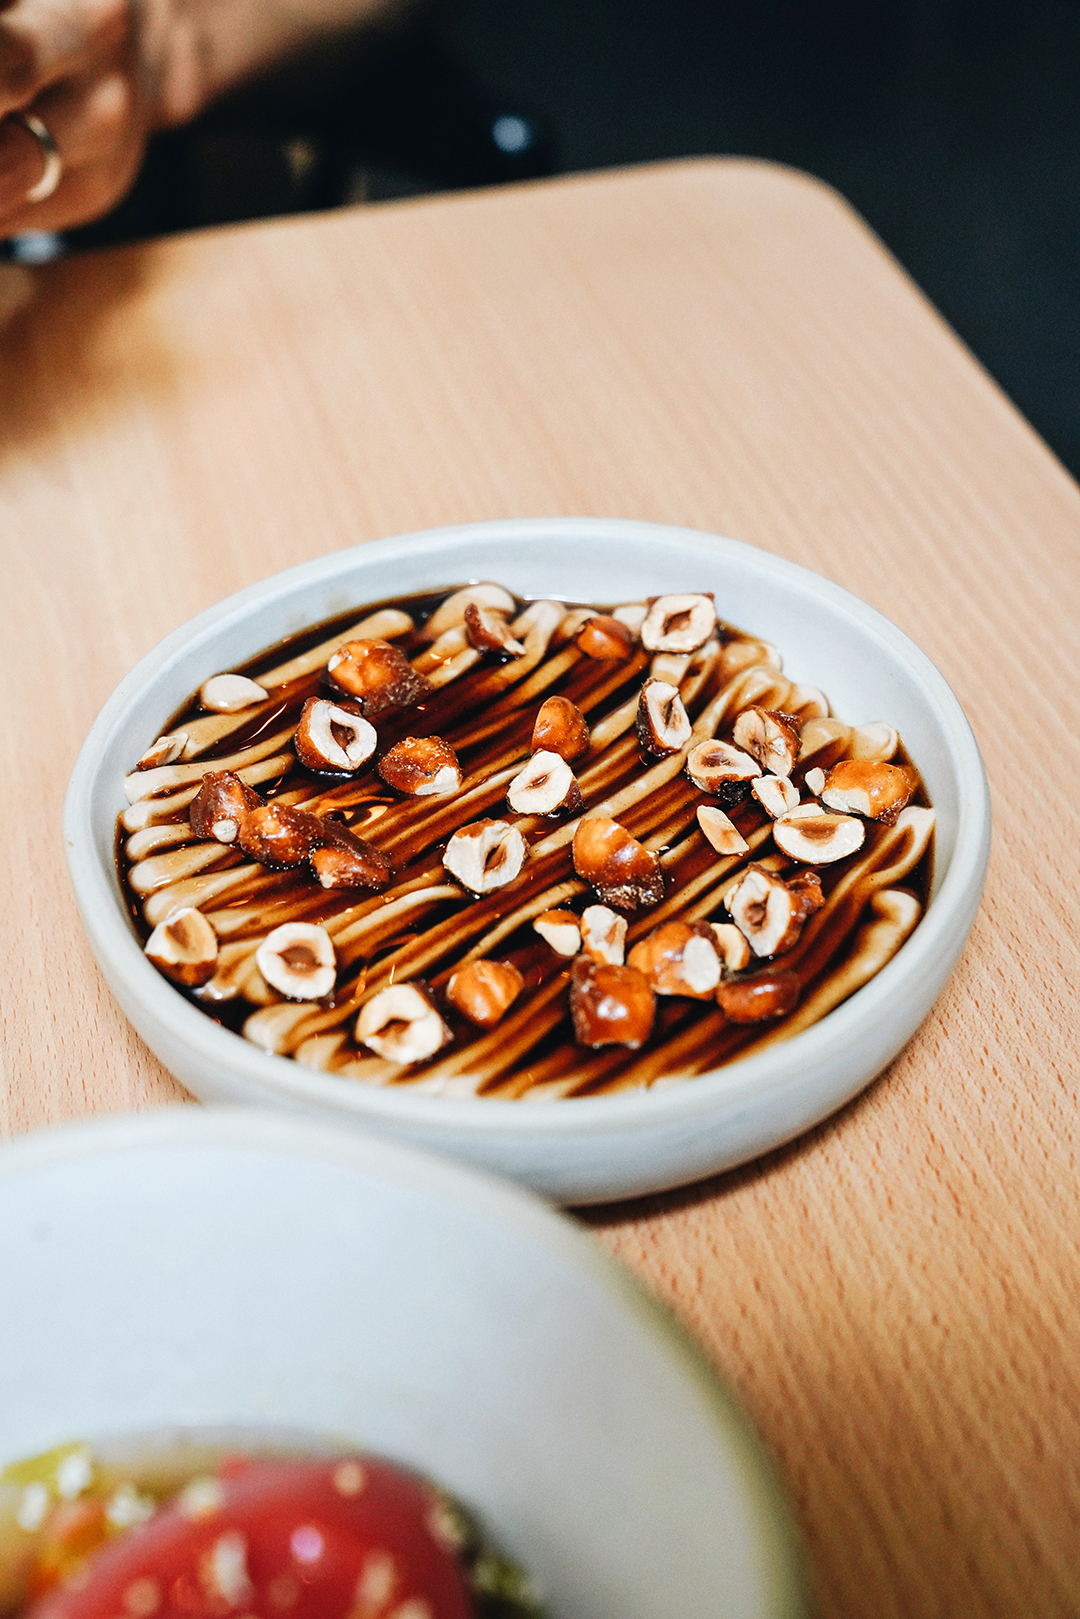 Coffee flan & hazelnuts